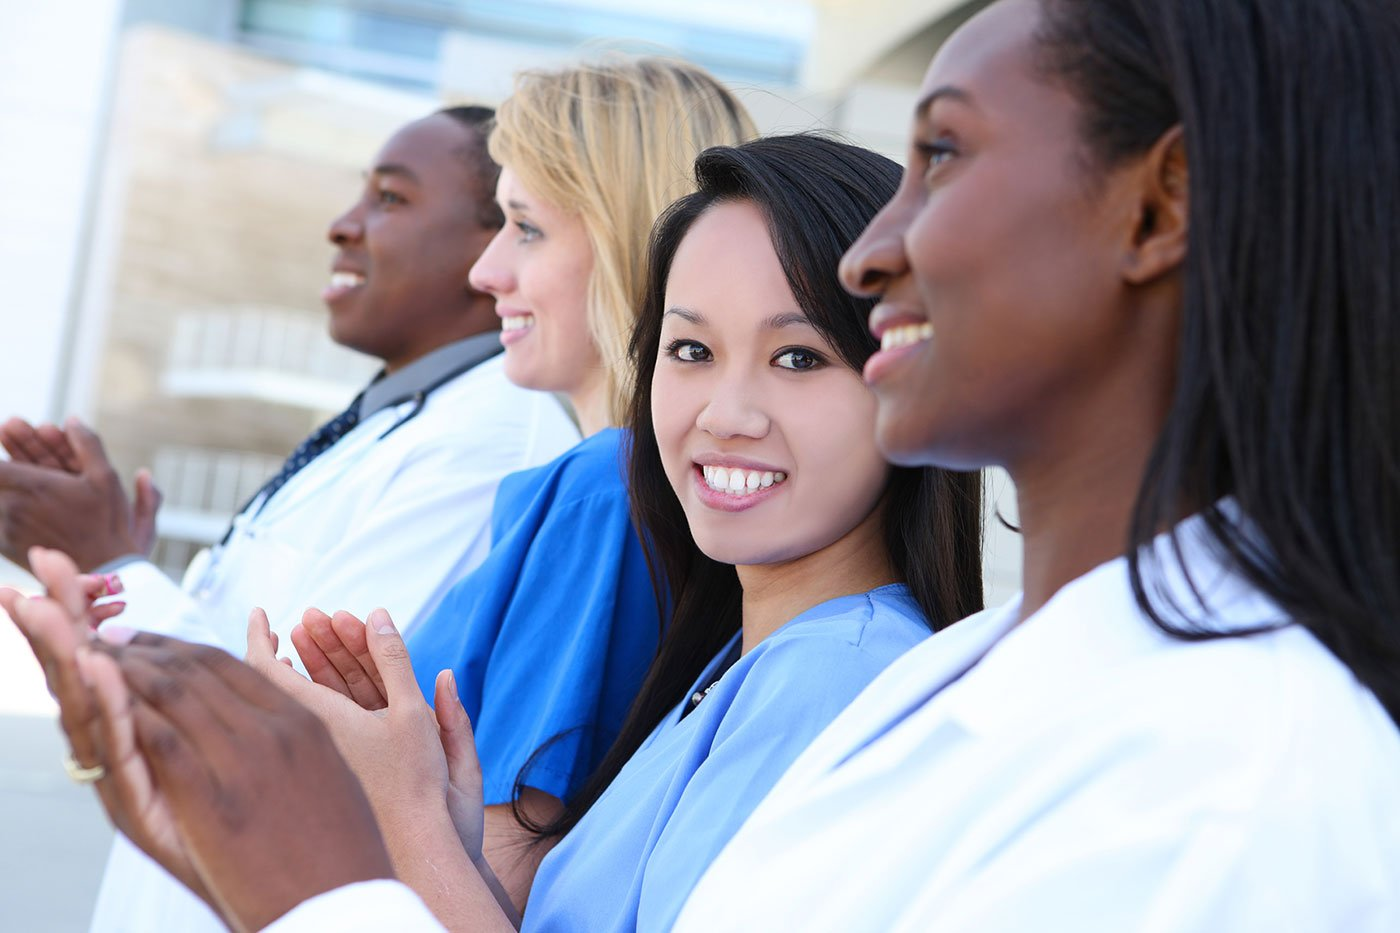 Explore Pharmacy Jobs - Pharmacy is Right for Me